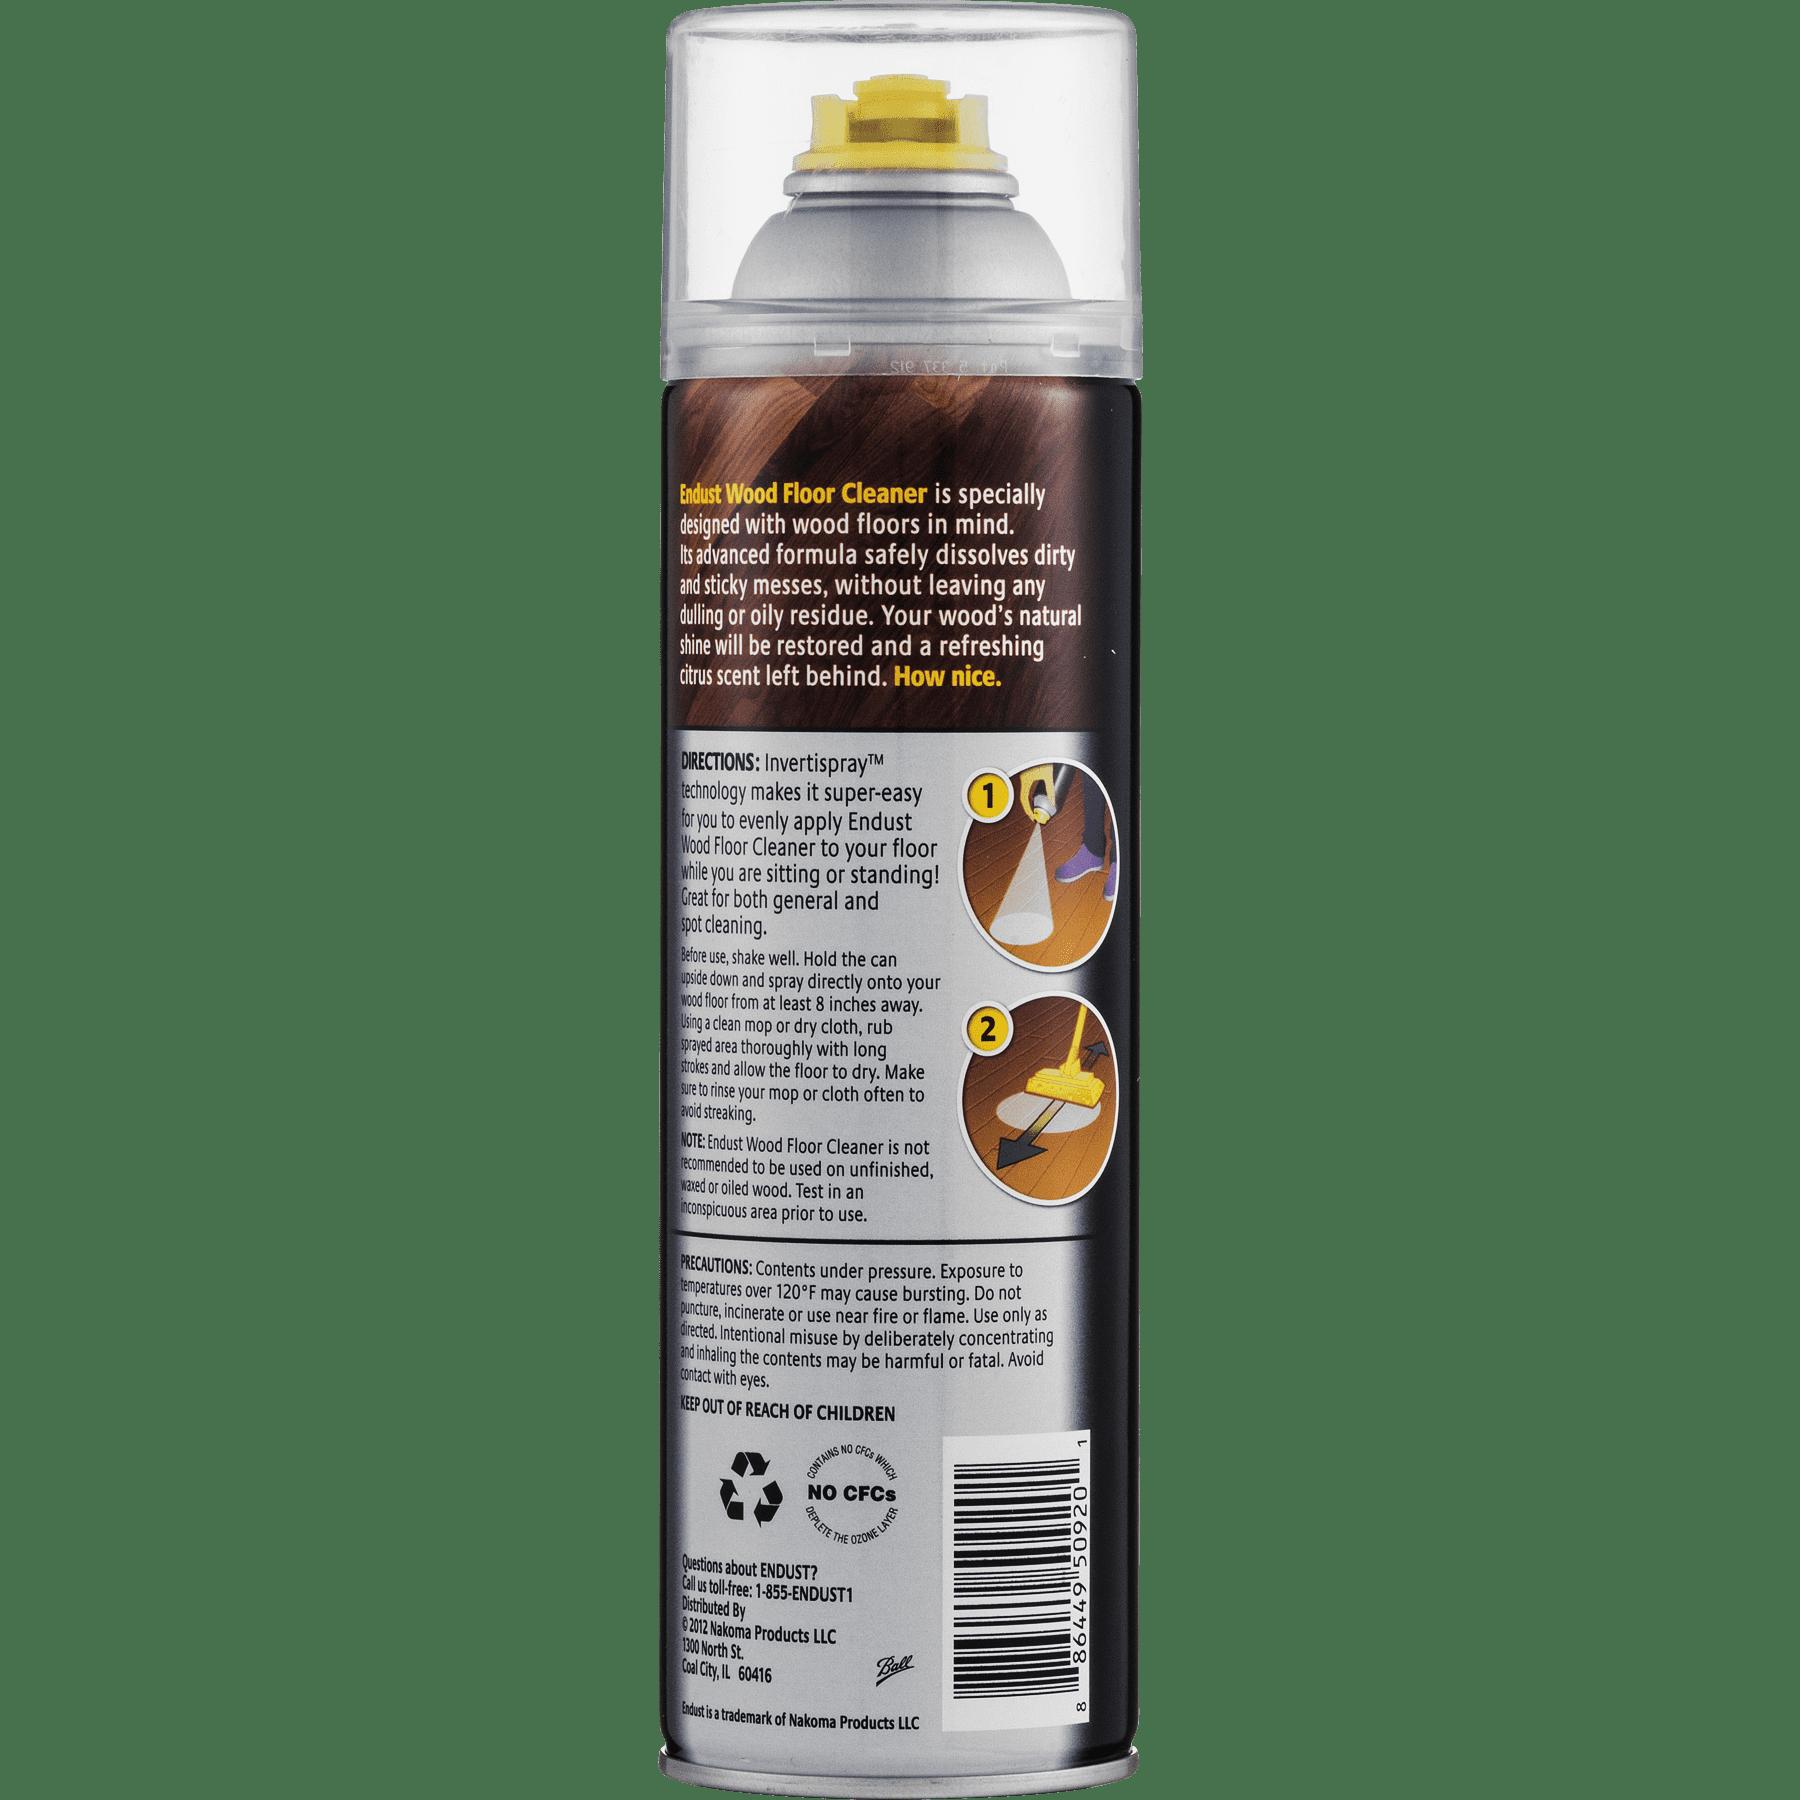 Endust Citrus Wood Floor Cleaner, 16 Oz - Walmart com